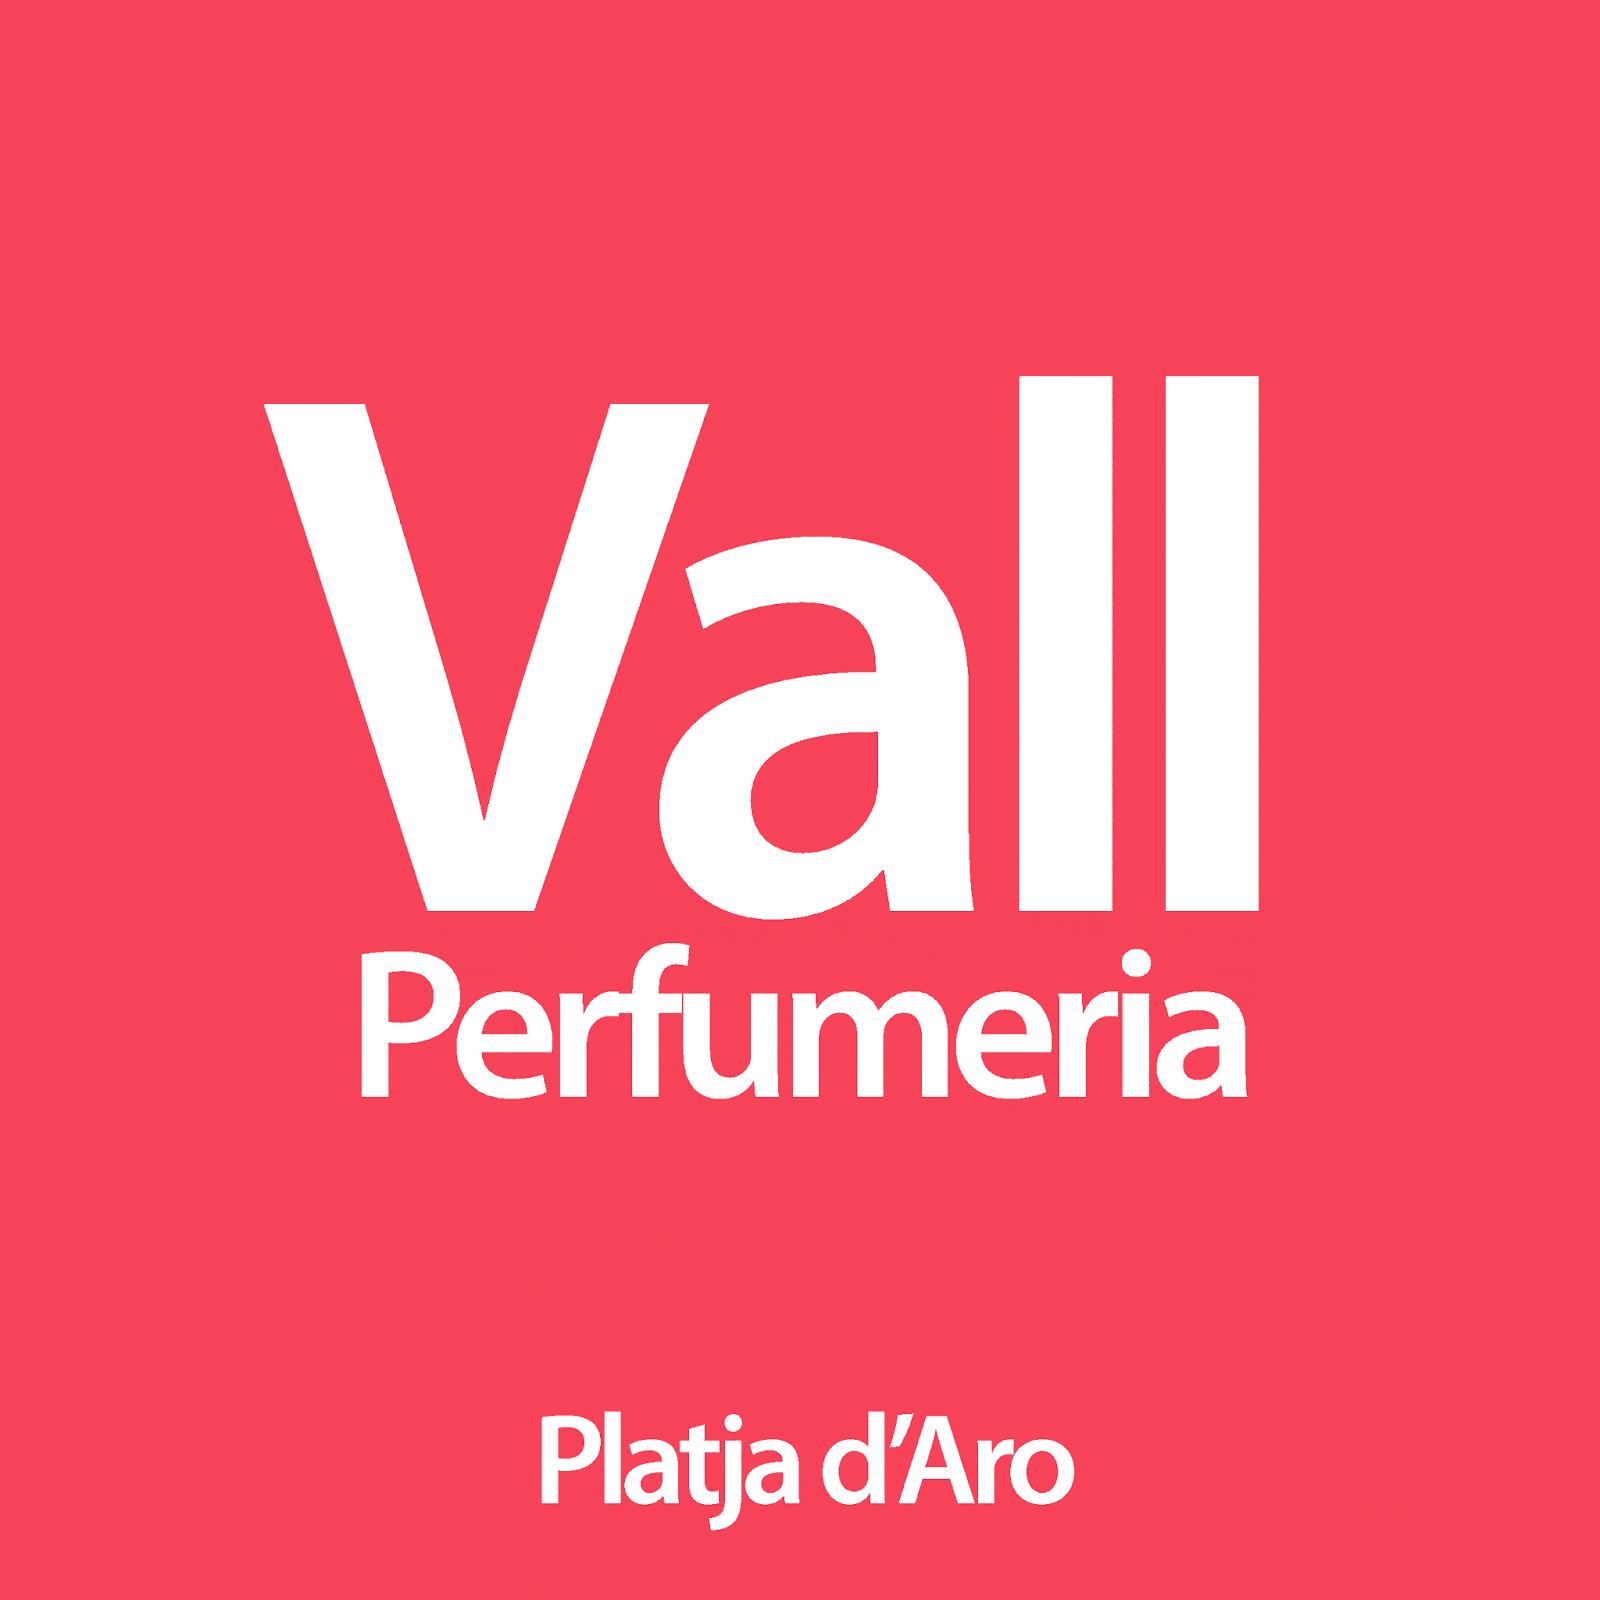 VALL PERFUMERIA